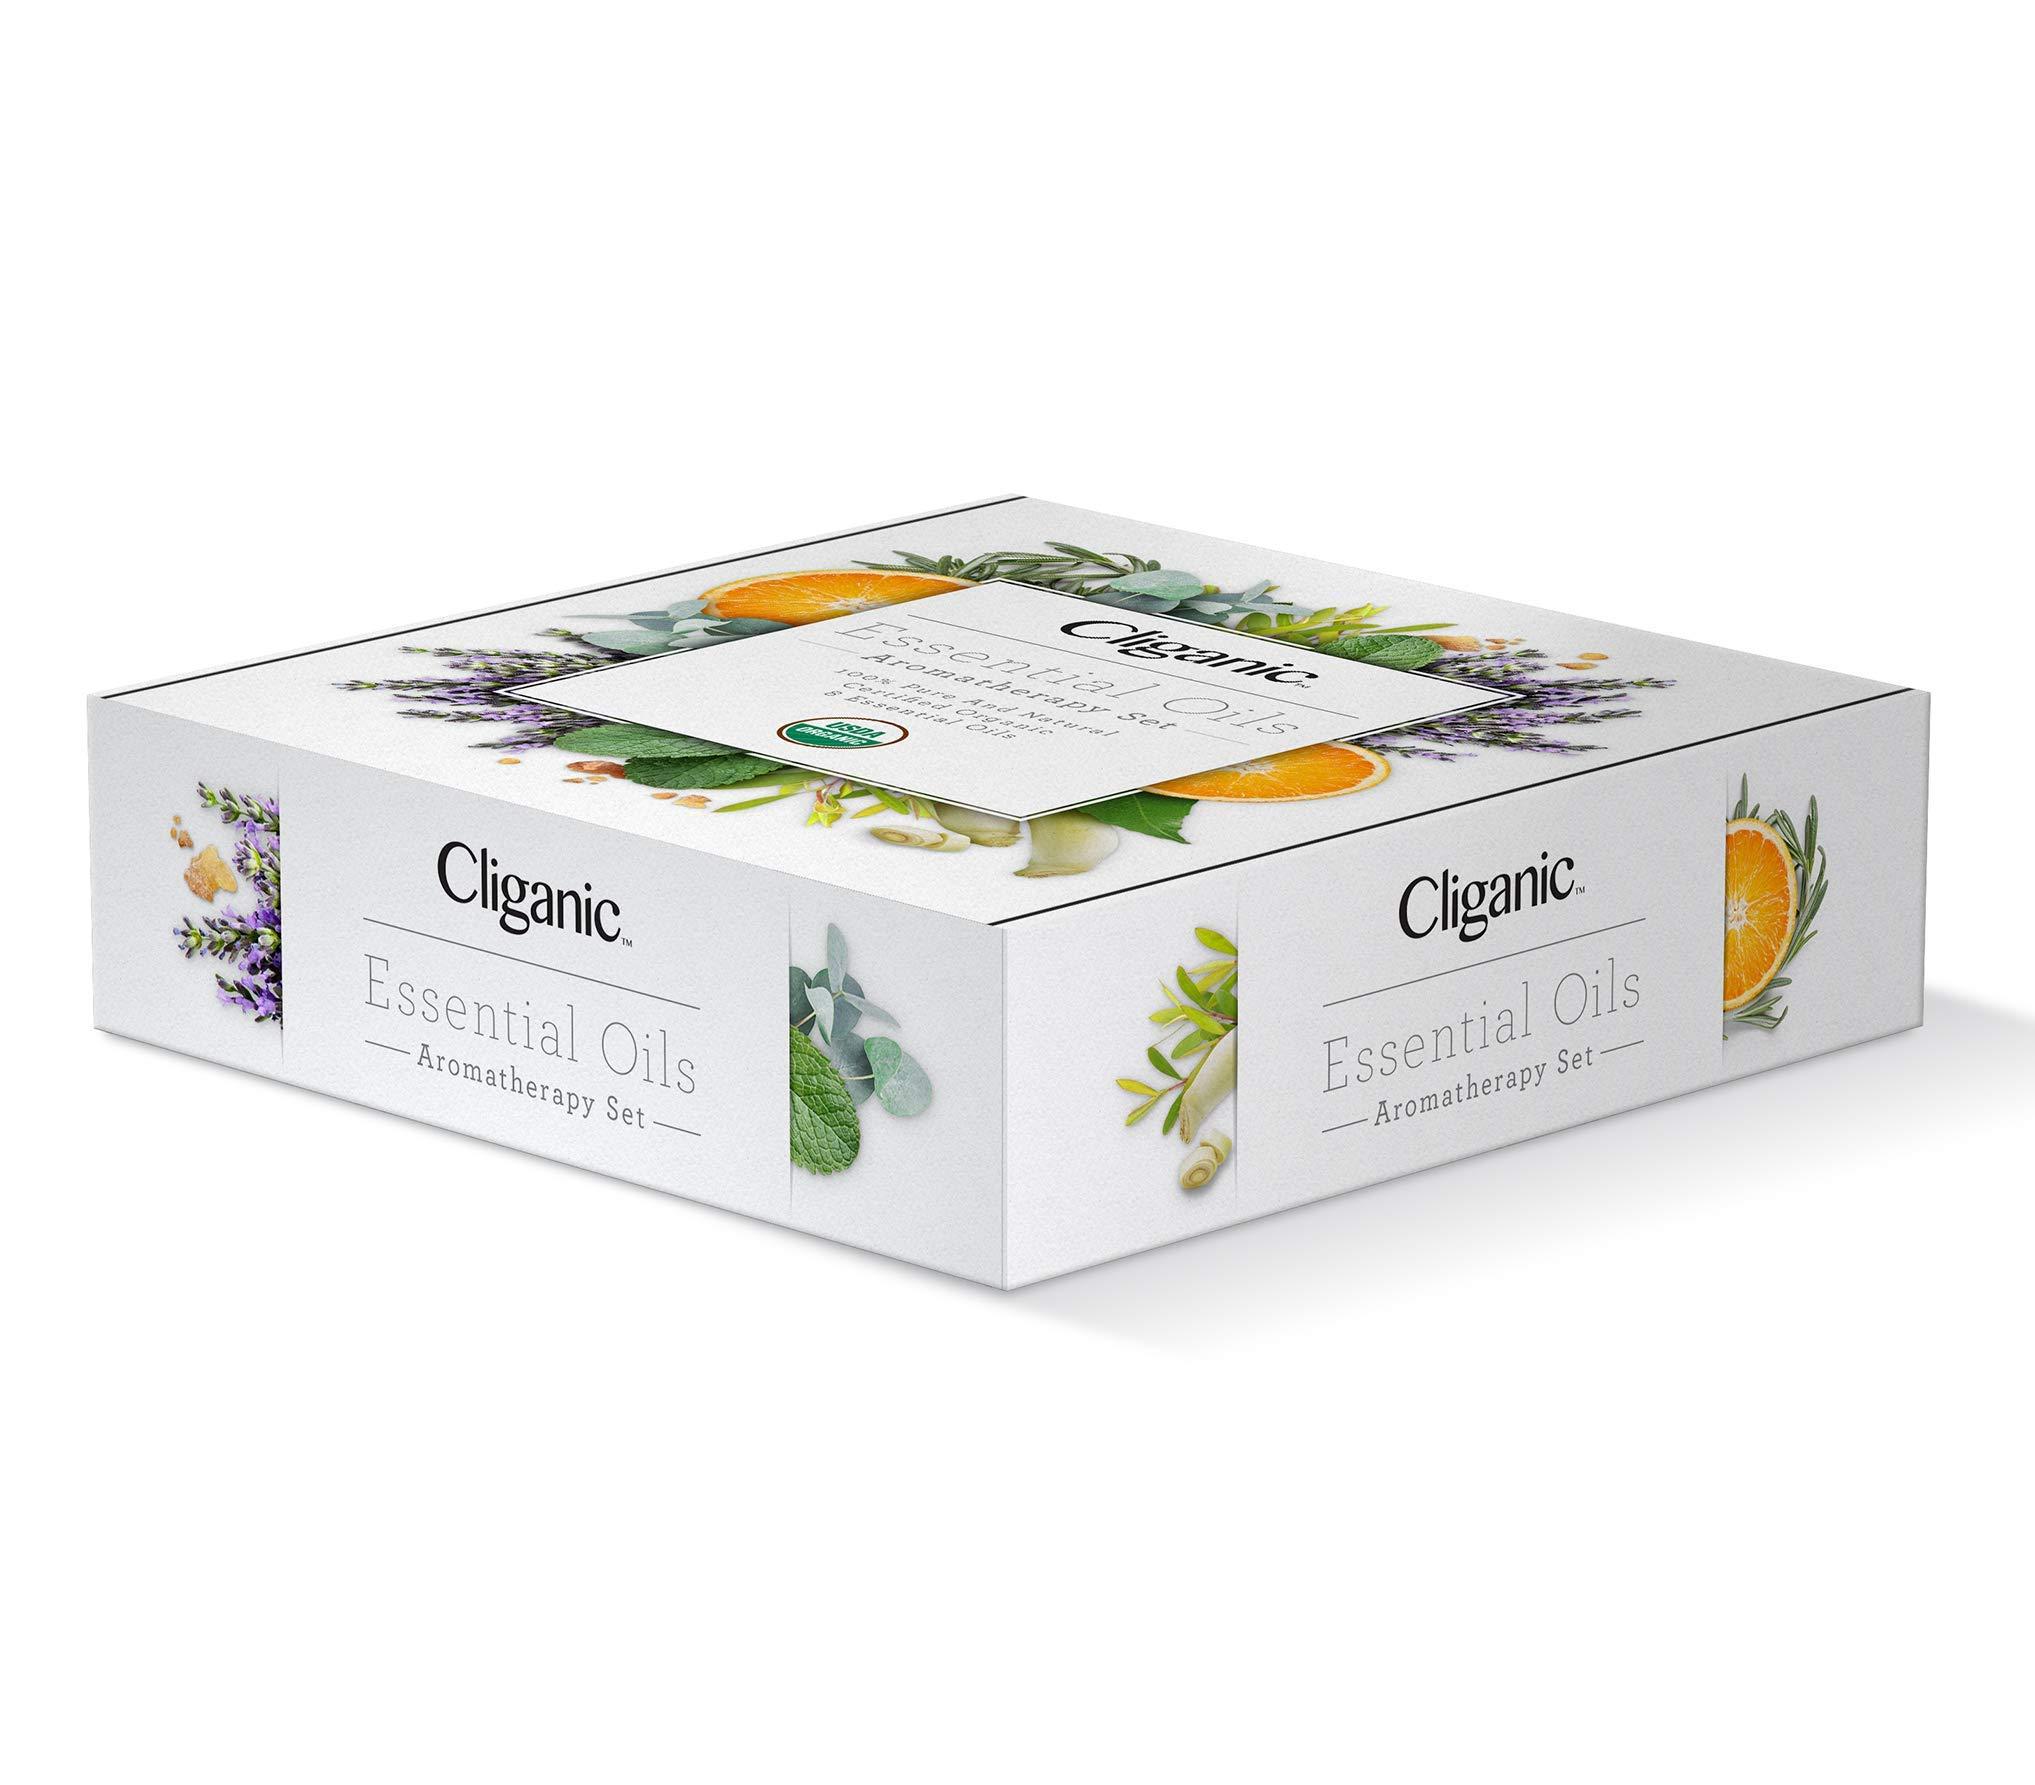 Cliganic USDA Organic Aromatherapy Essential Oils Set (8 Pack), 100% Pure Natural - Peppermint, Lavender, Eucalyptus, Tea Tree, Lemongrass, Rosemary, Frankincense & Orange | Cliganic 90 Days Warranty by Cliganic (Image #4)